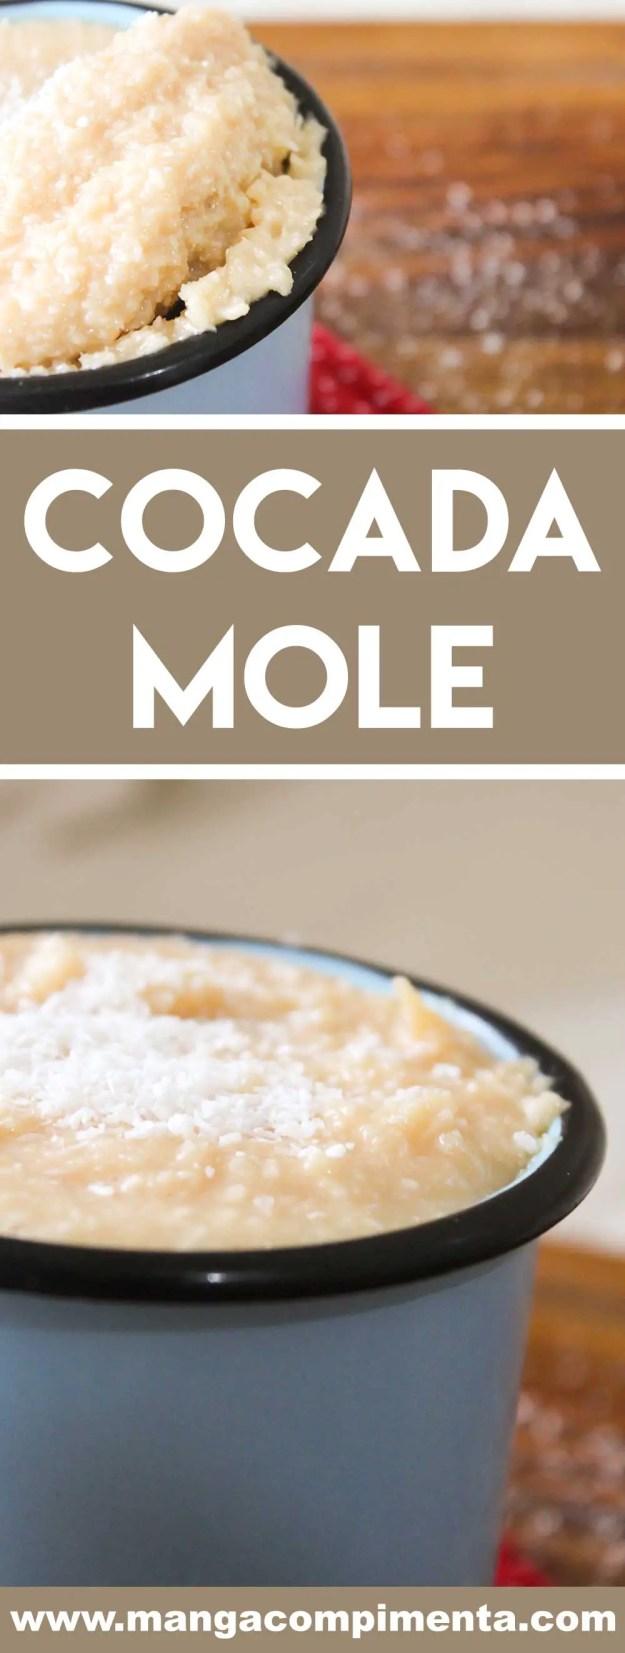 Receita de Cocada Mole - prepare para a Festa Junina da sua família e amigos.